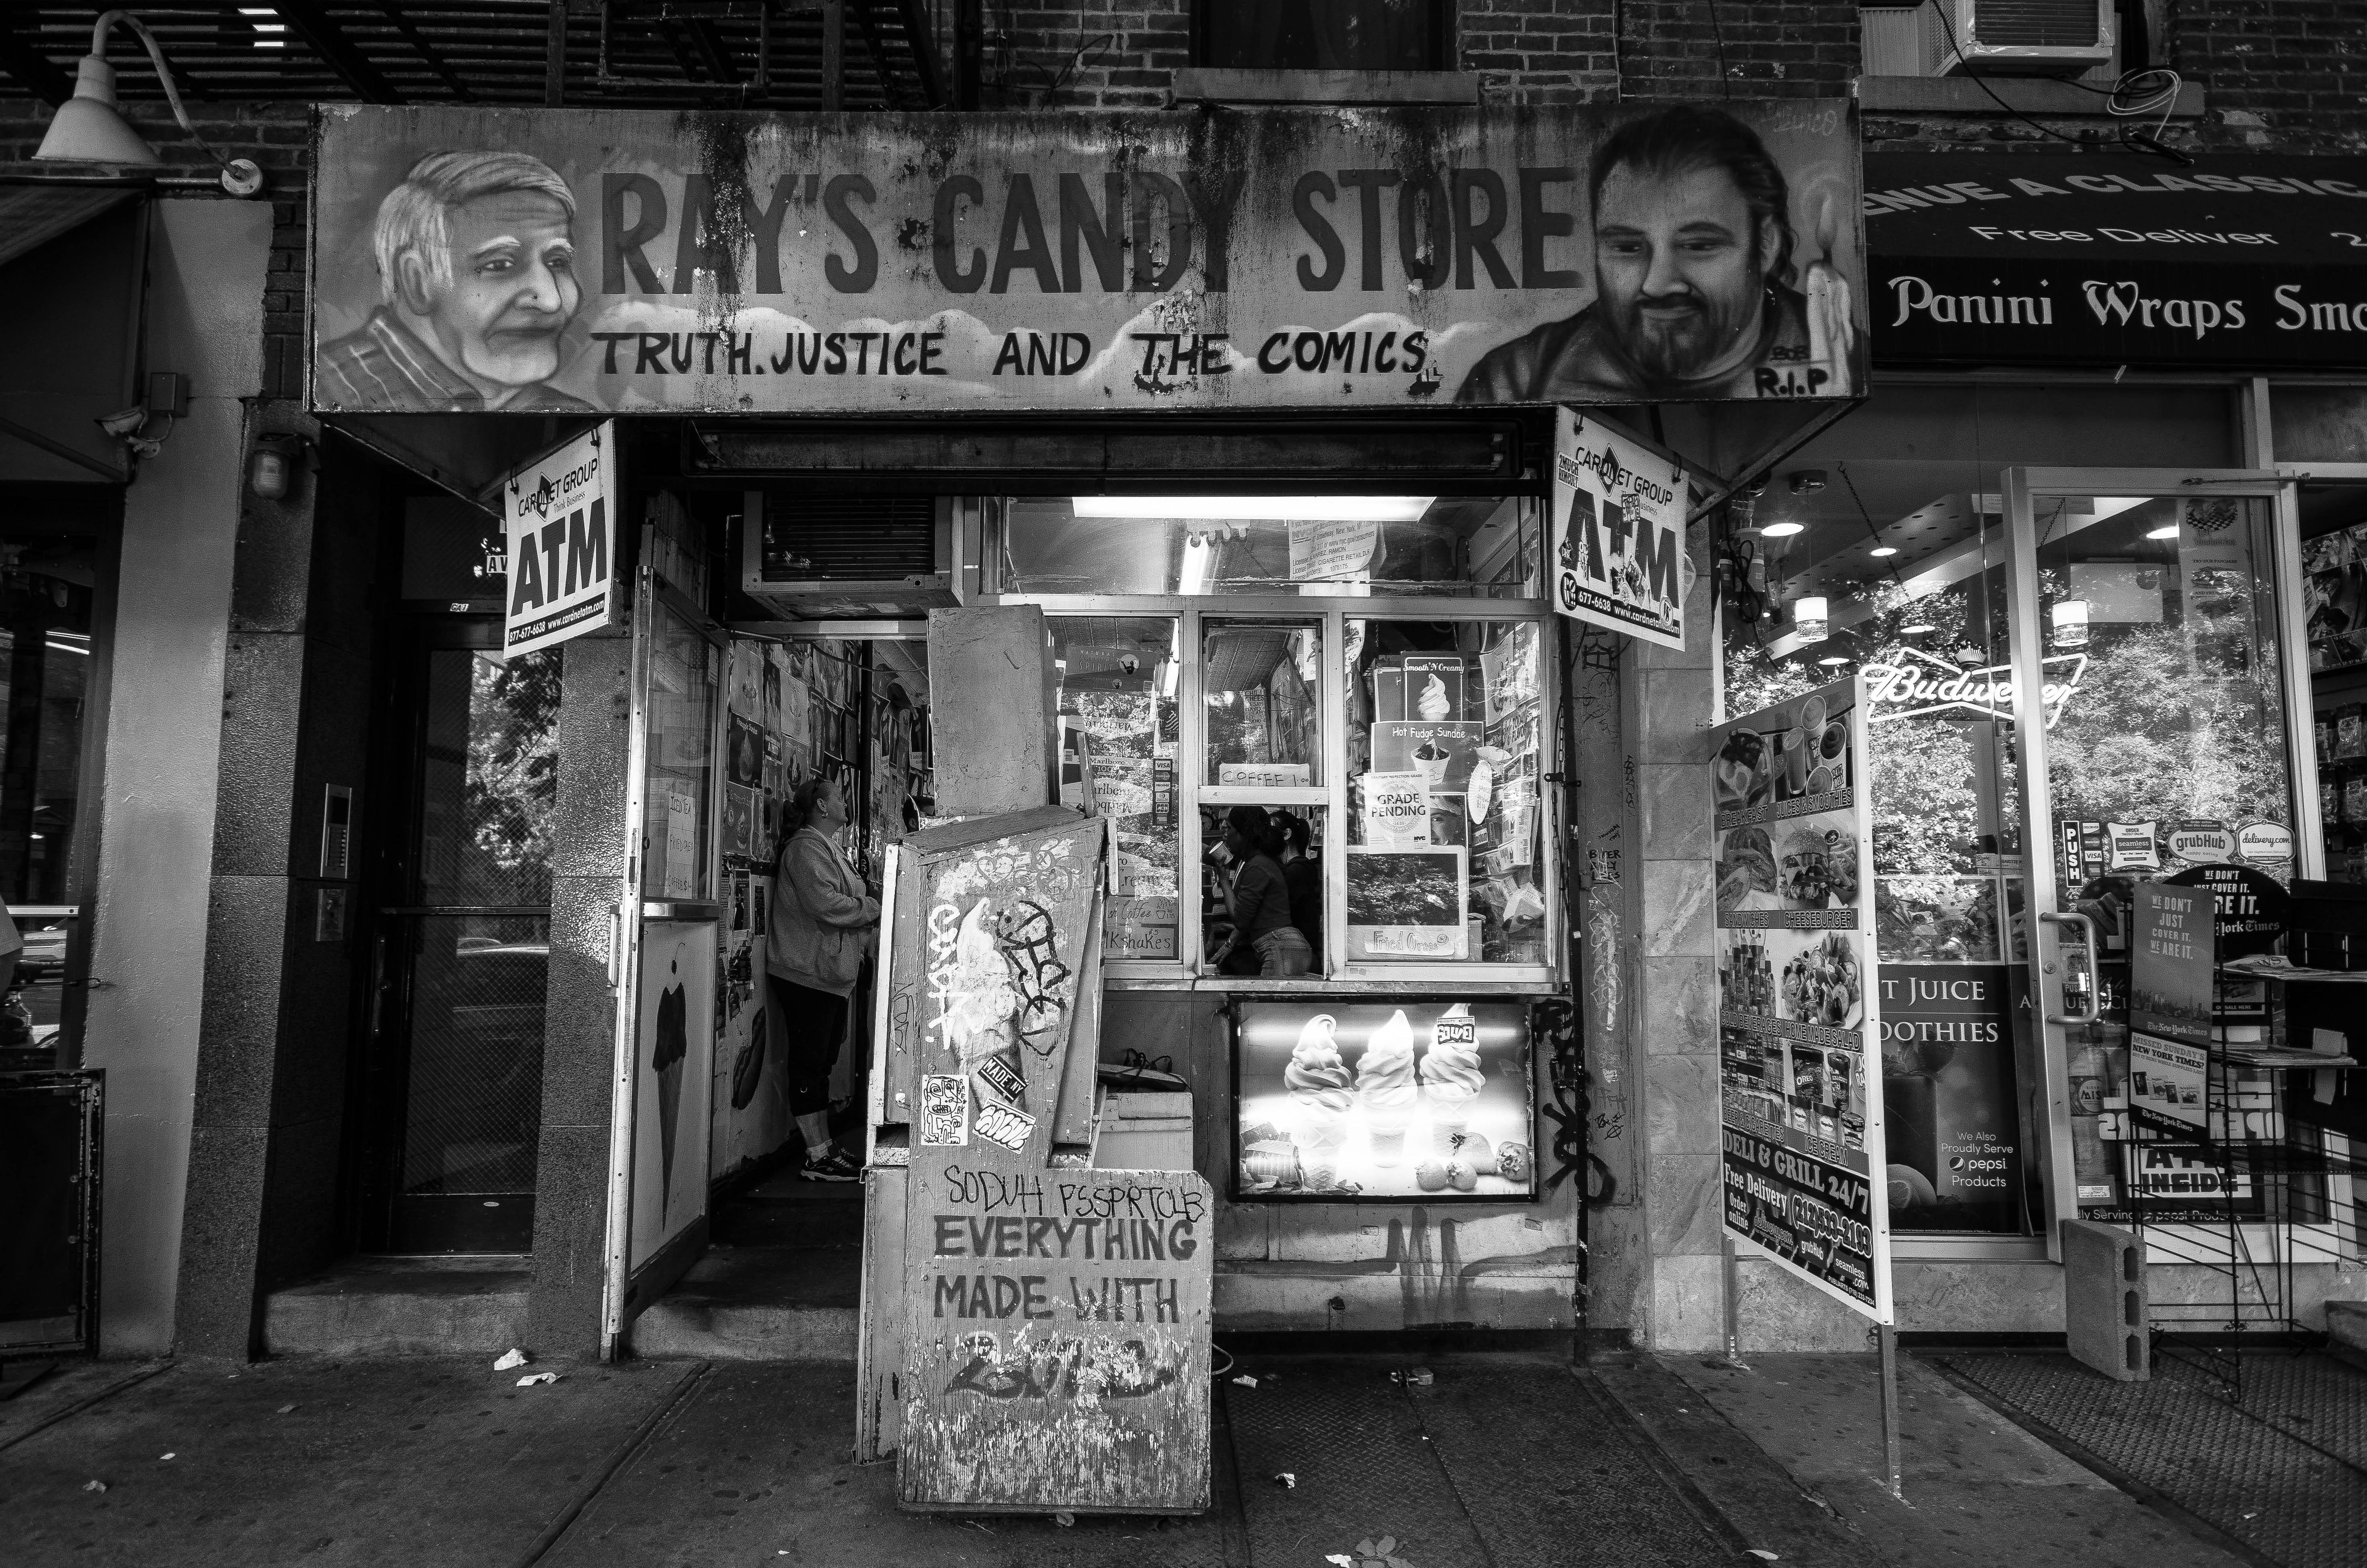 nyc street bw candy alley blanco negro graffiti urban manhattan eastvillage raw east noir storefront blanc york infrastructure area tienda